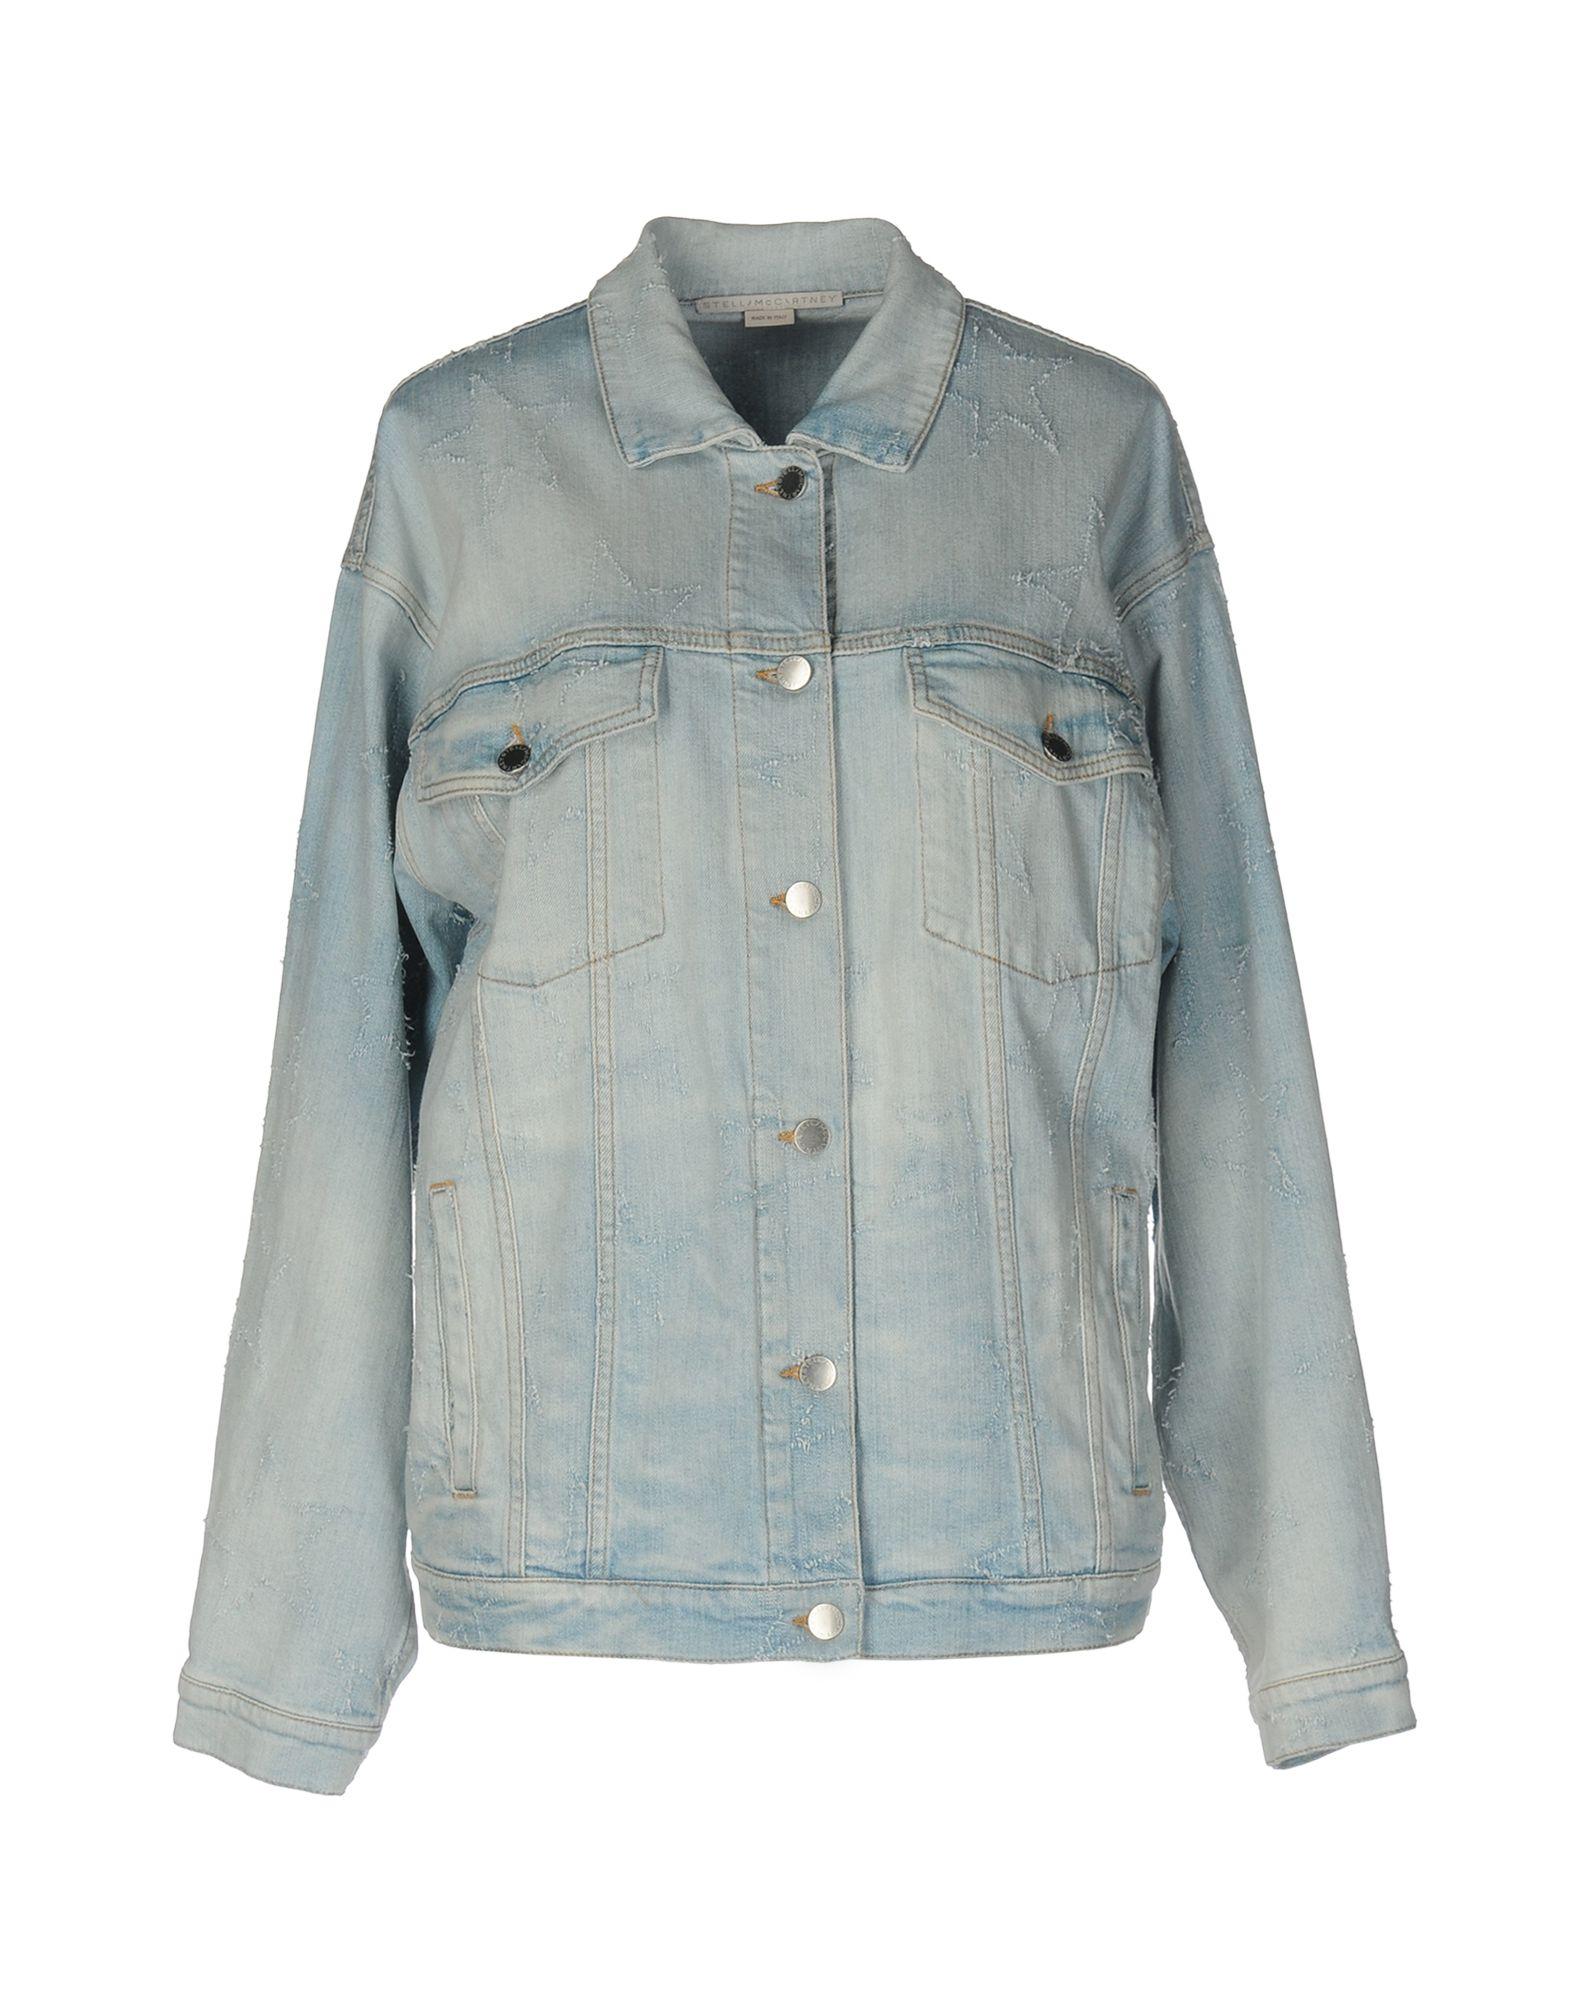 SOLD OUT Giubbotto Jeans Stella Mccartney Donna - Acquista online su rCHuFz